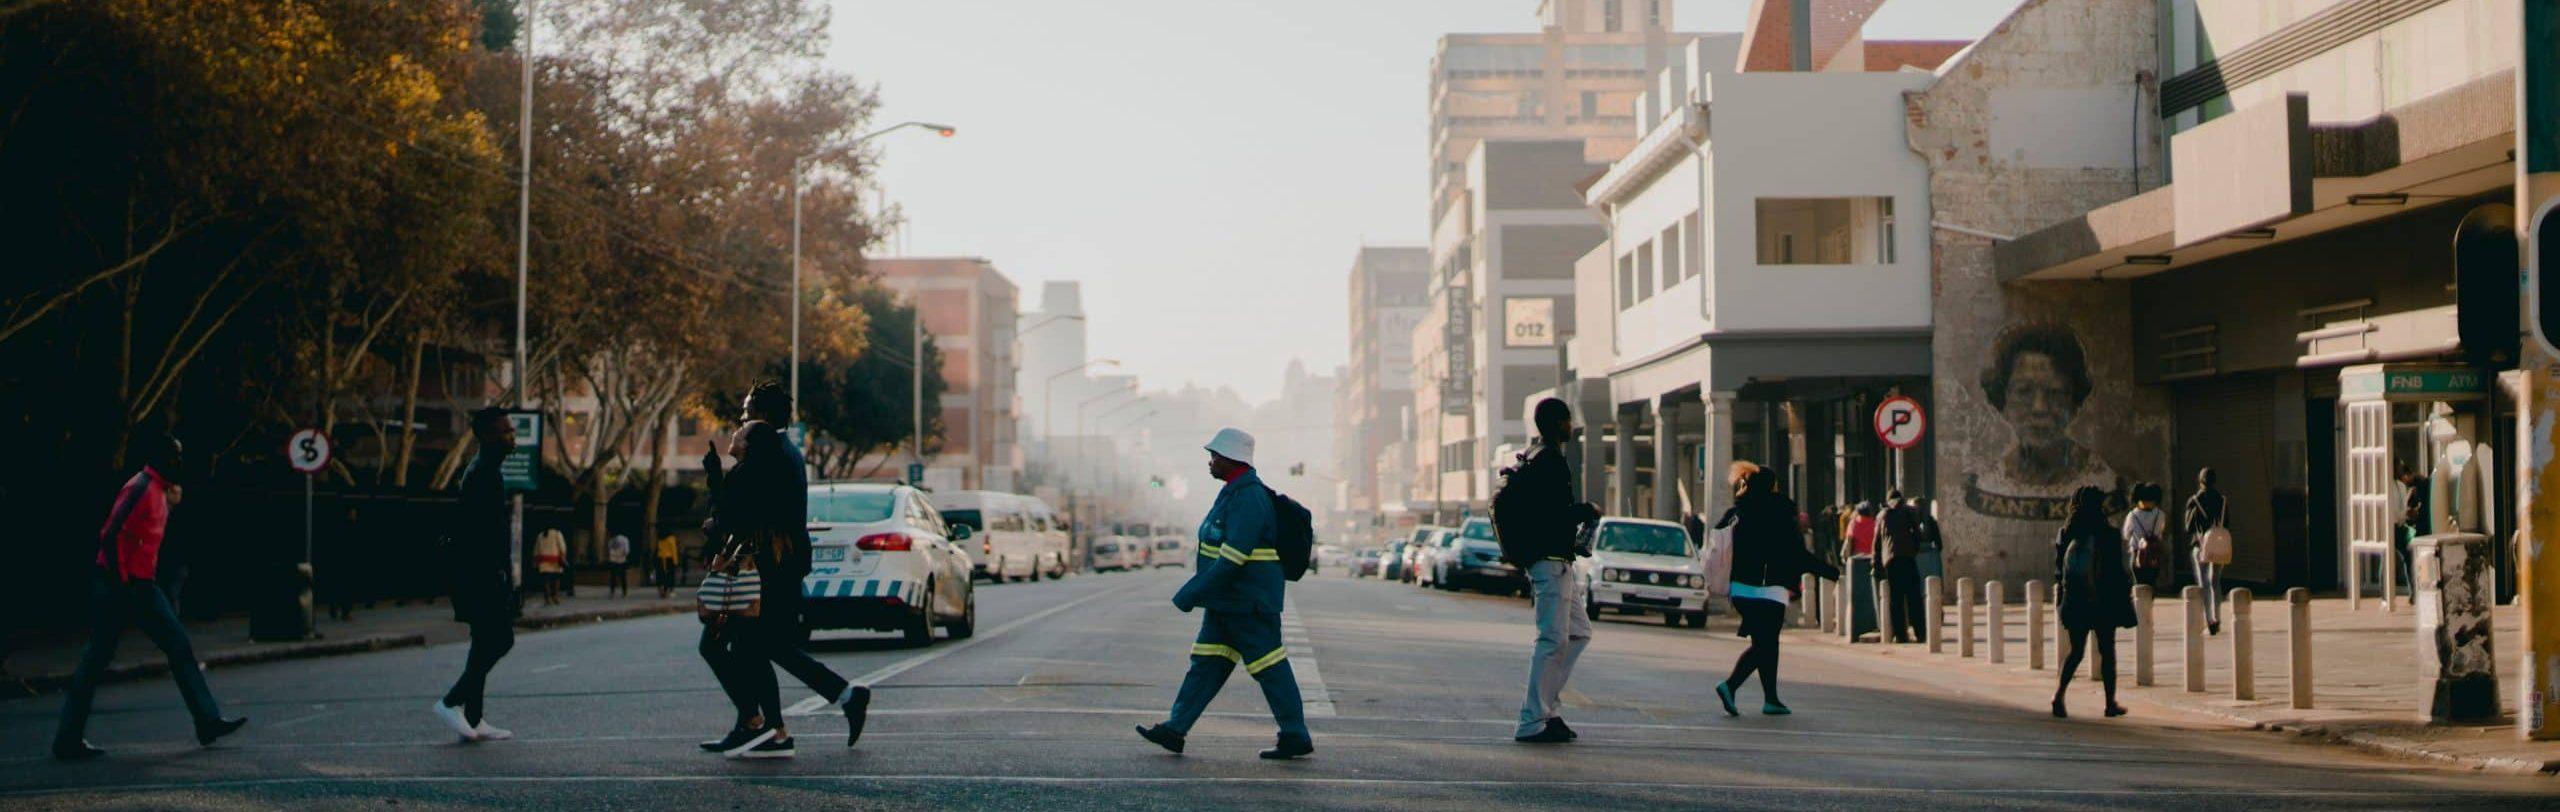 How To Improve Urban Health | Photo by Rachel Martin on Unsplash